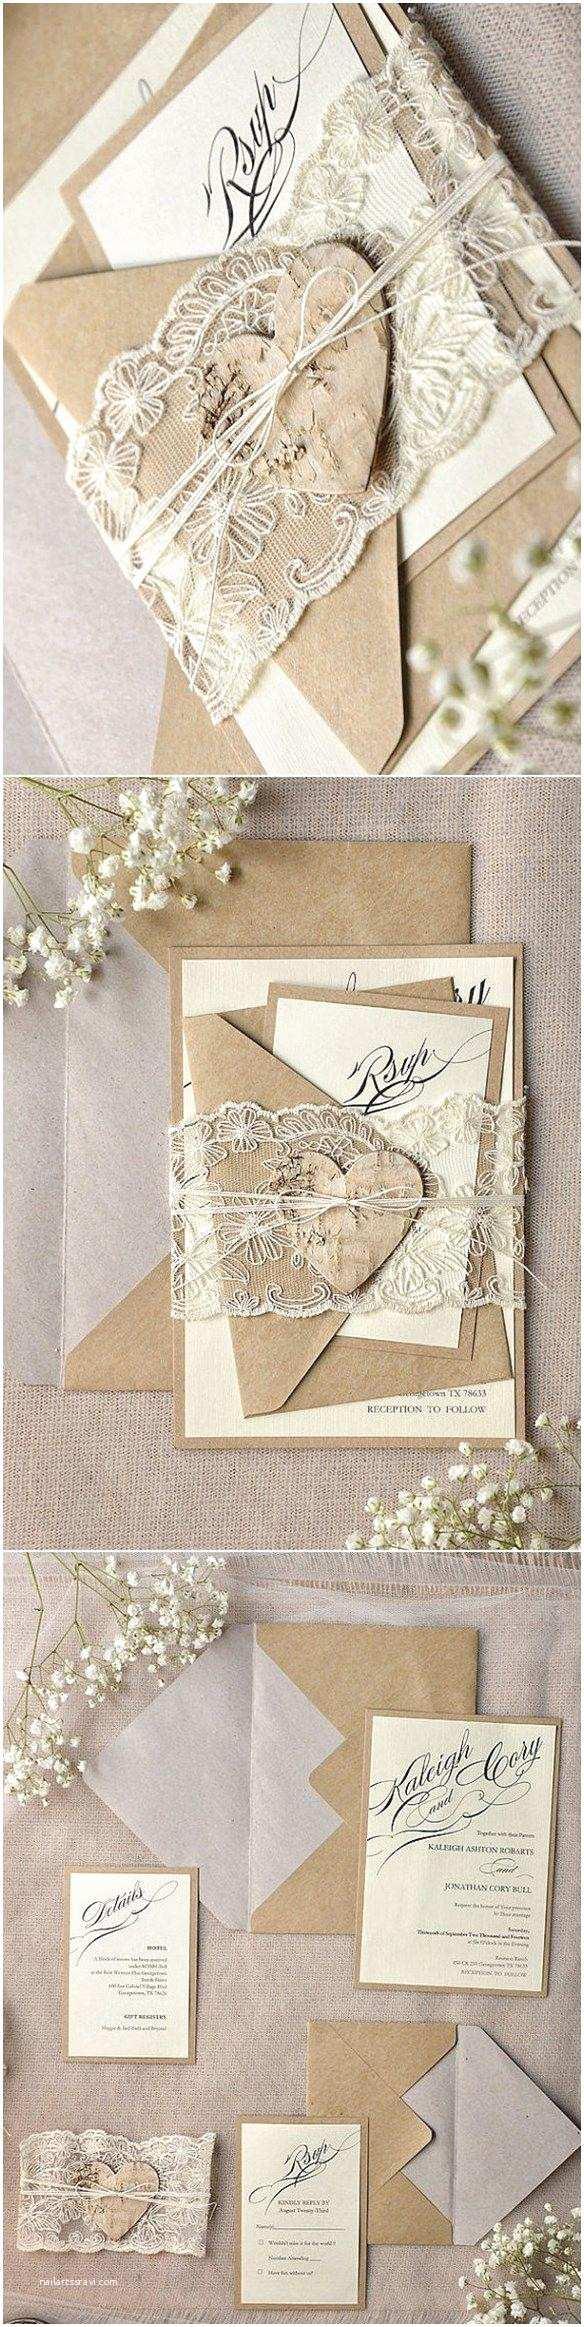 Diy Calligraphy Wedding Invitations Rustic Calligraphy Recycled Lace Wedding Invitation Kits